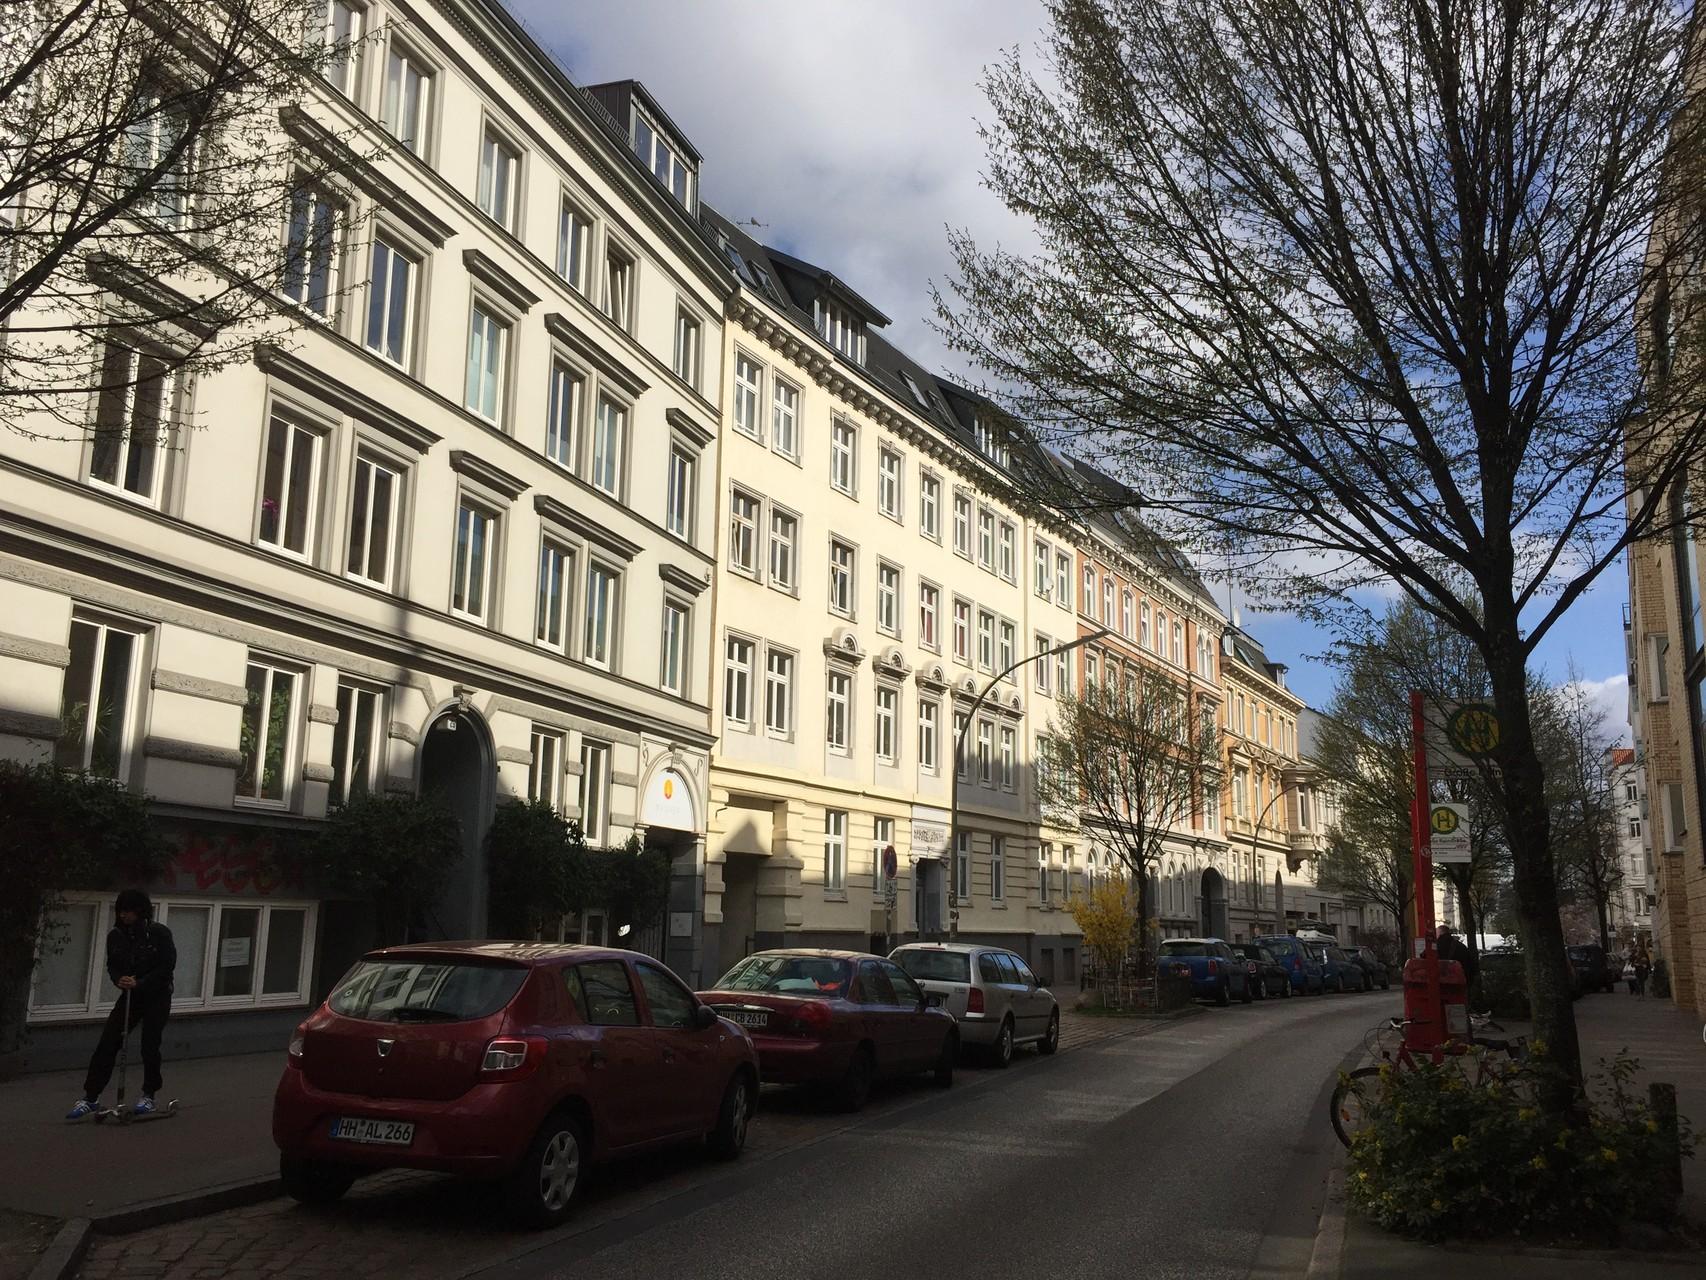 Große Rainstraße